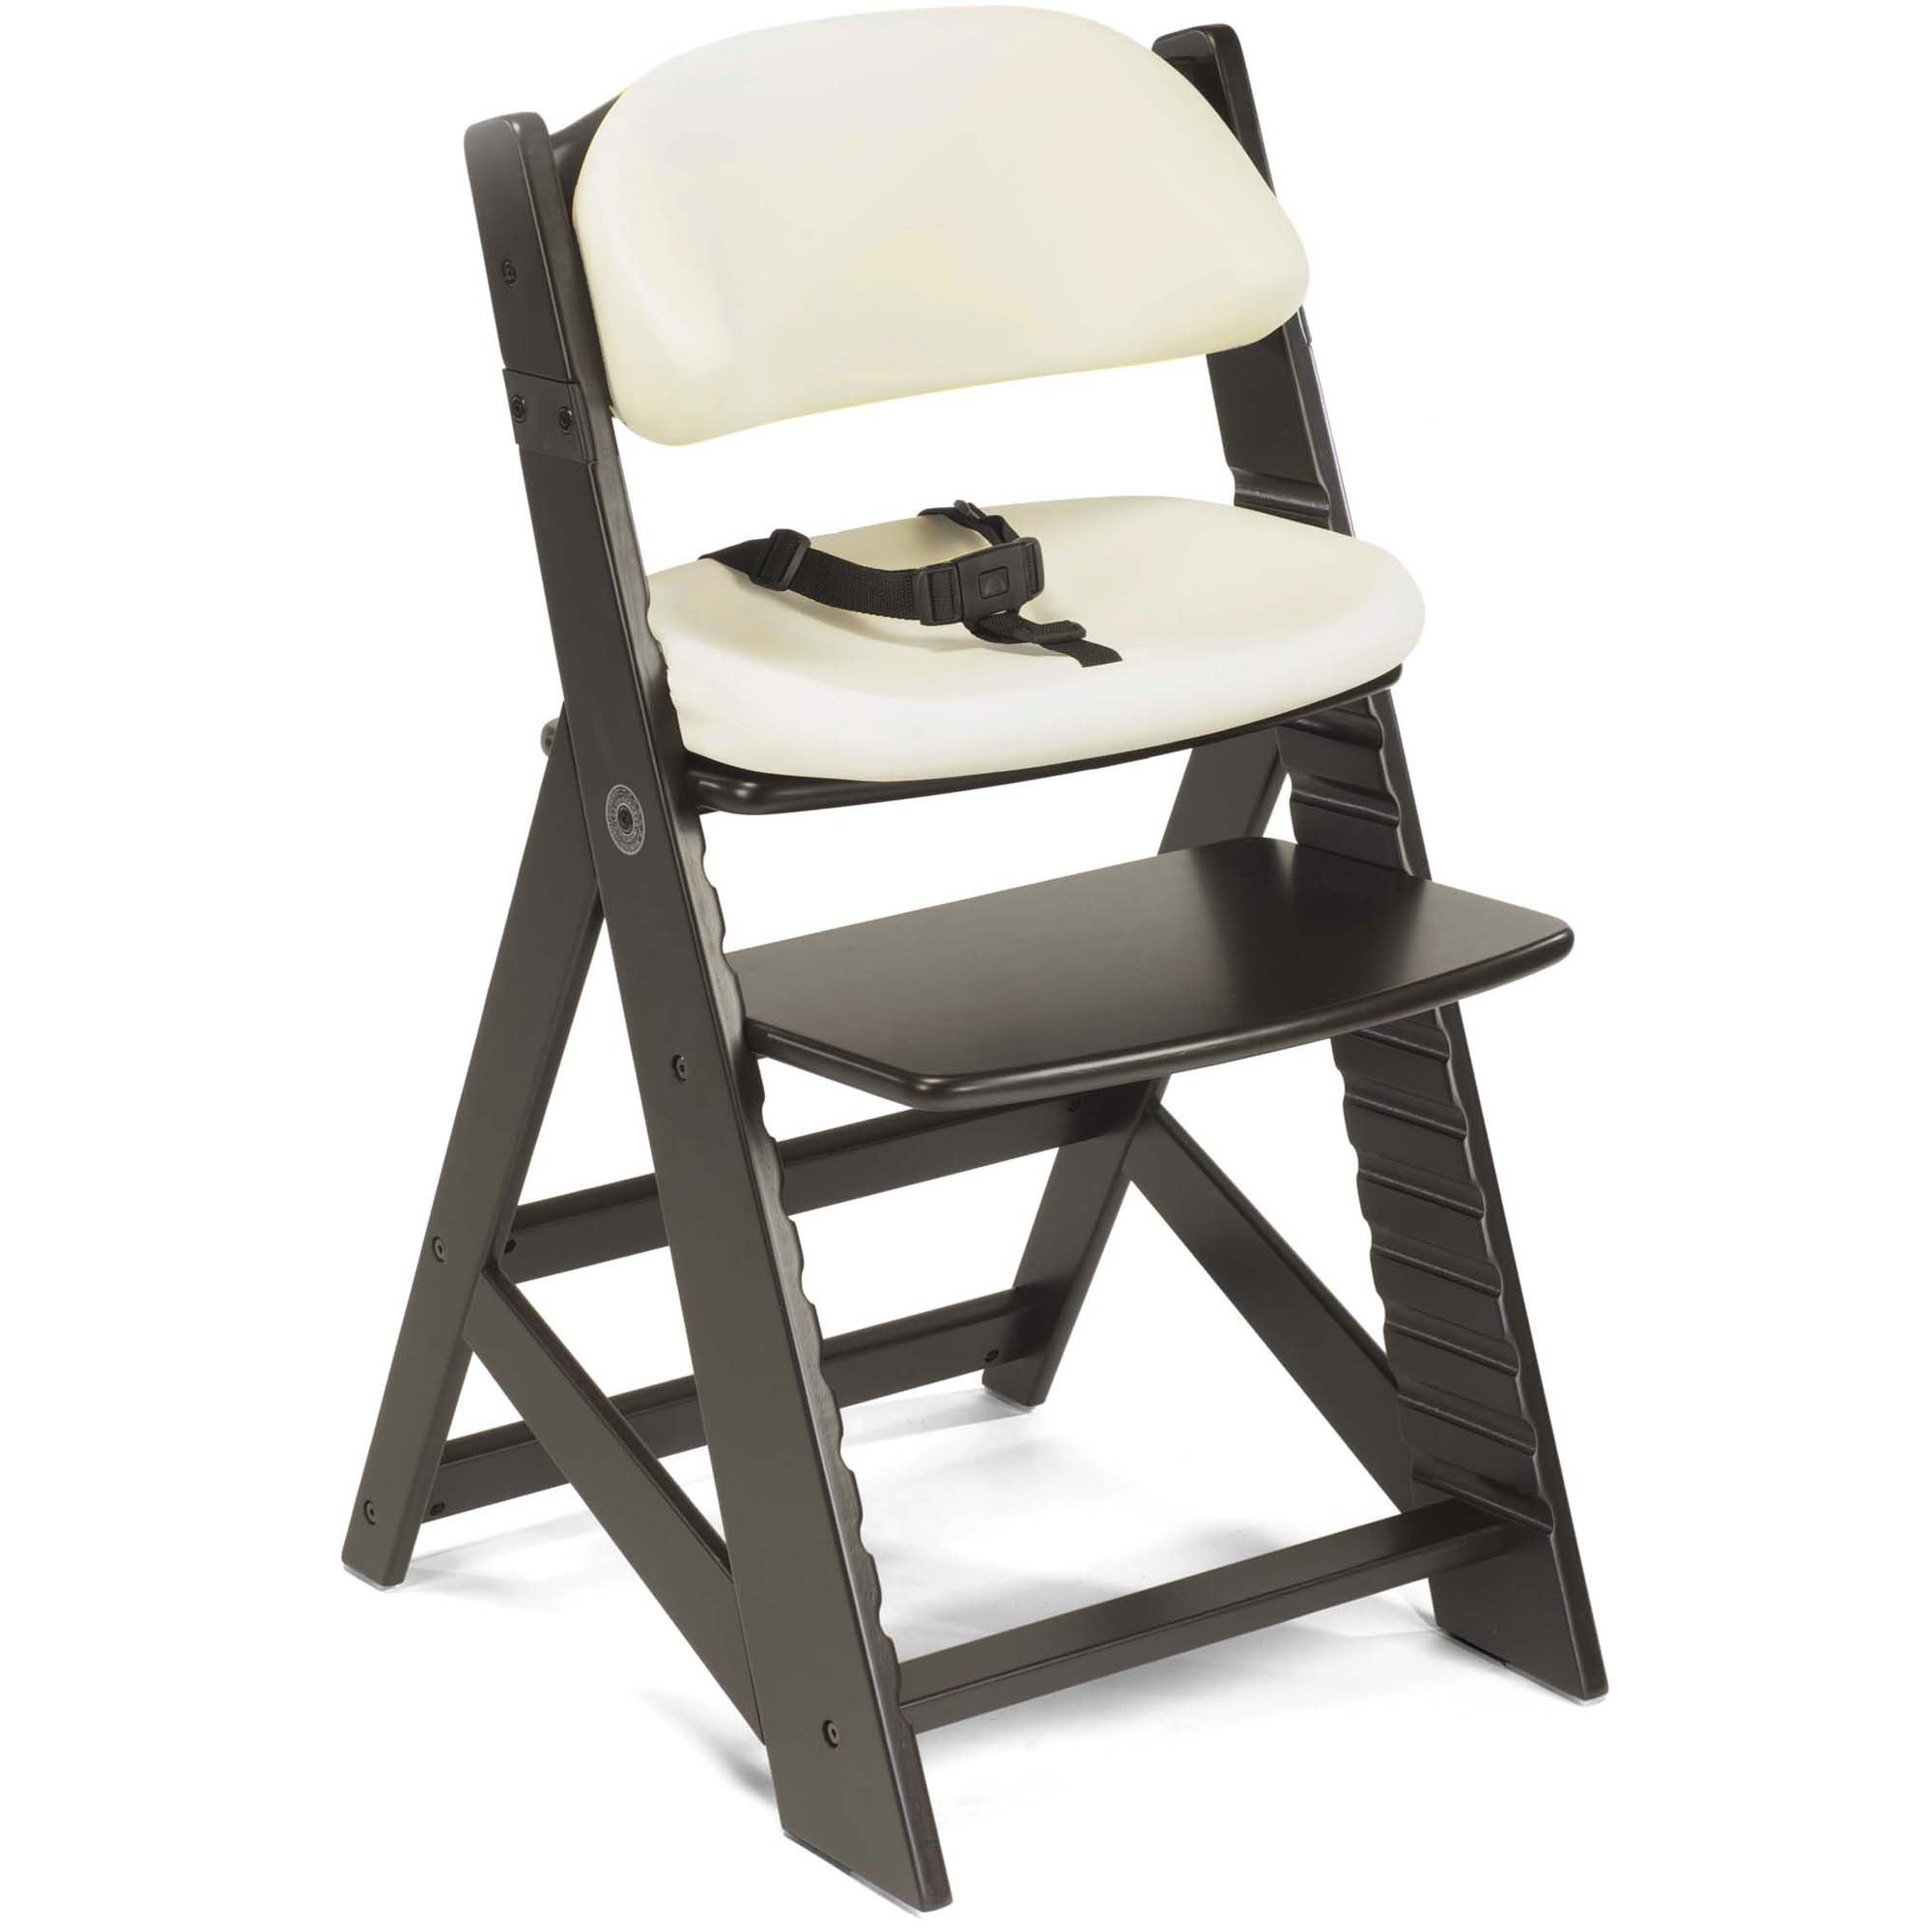 Keekaroo Height Right Kids Chair with Comfort Cushions - Vanilla - Espresso Base